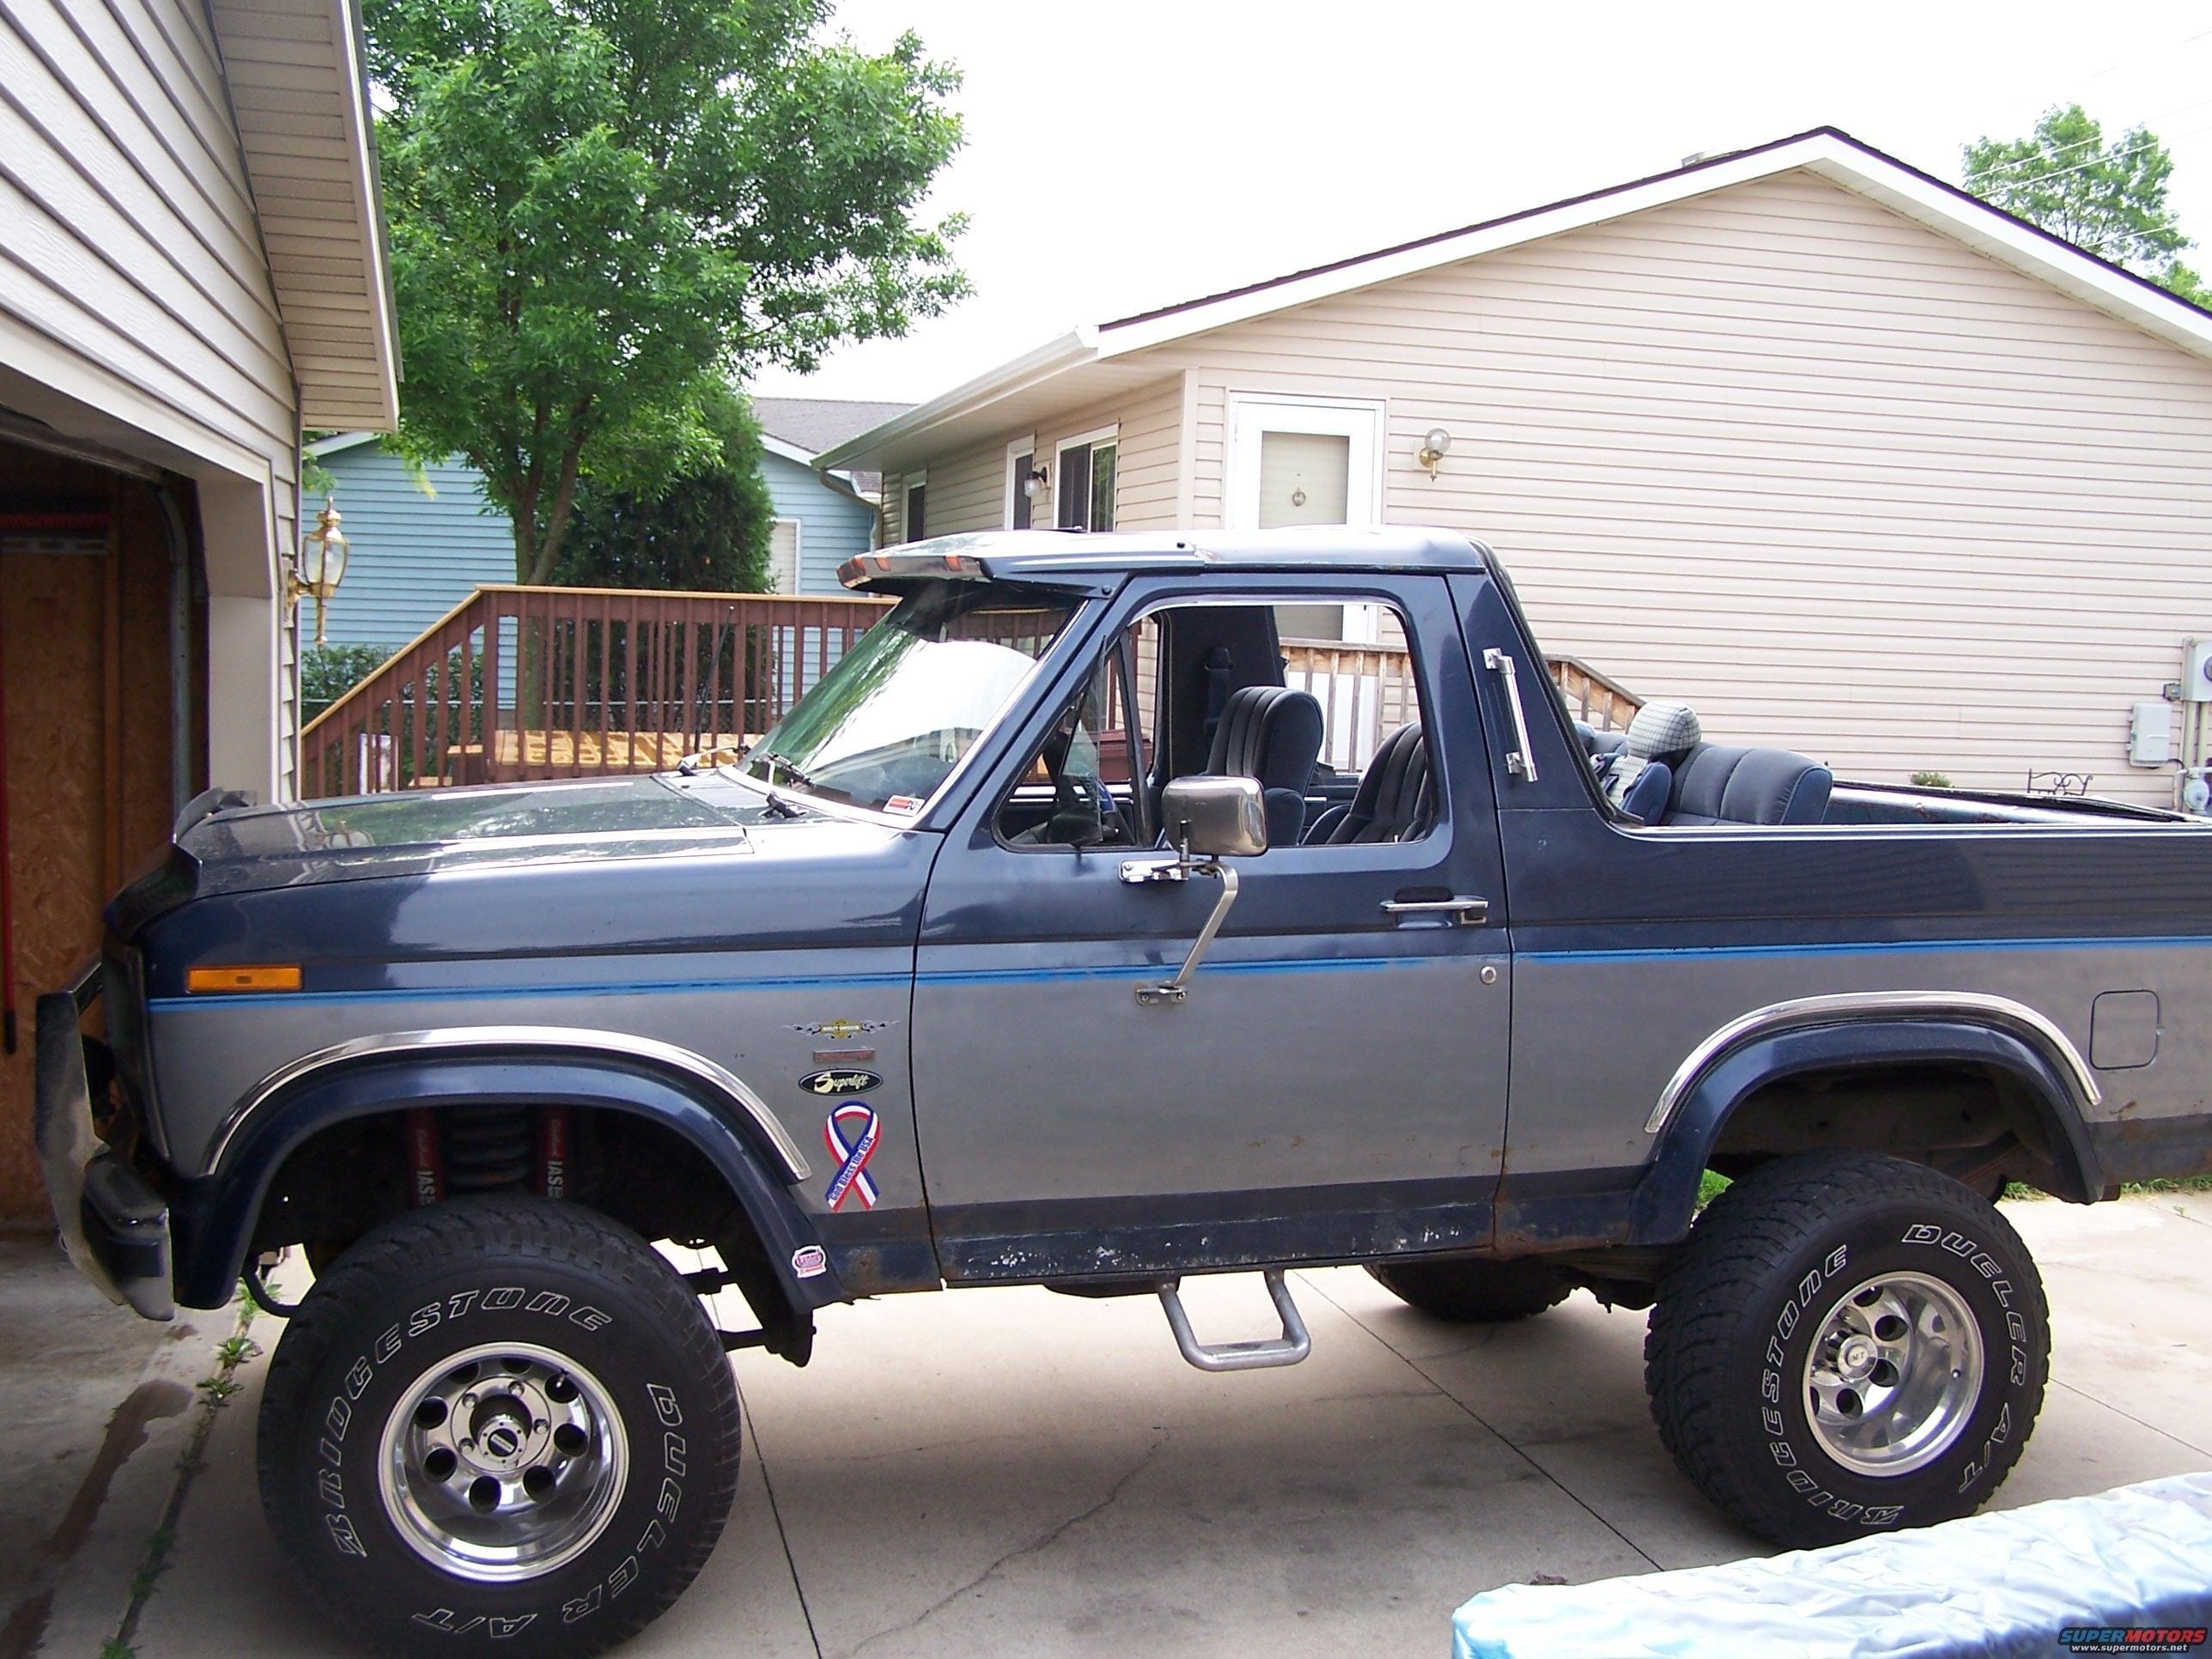 Ford bronco suv 4x4 truck wallpaper 2576x1932 775700 wallpaperup